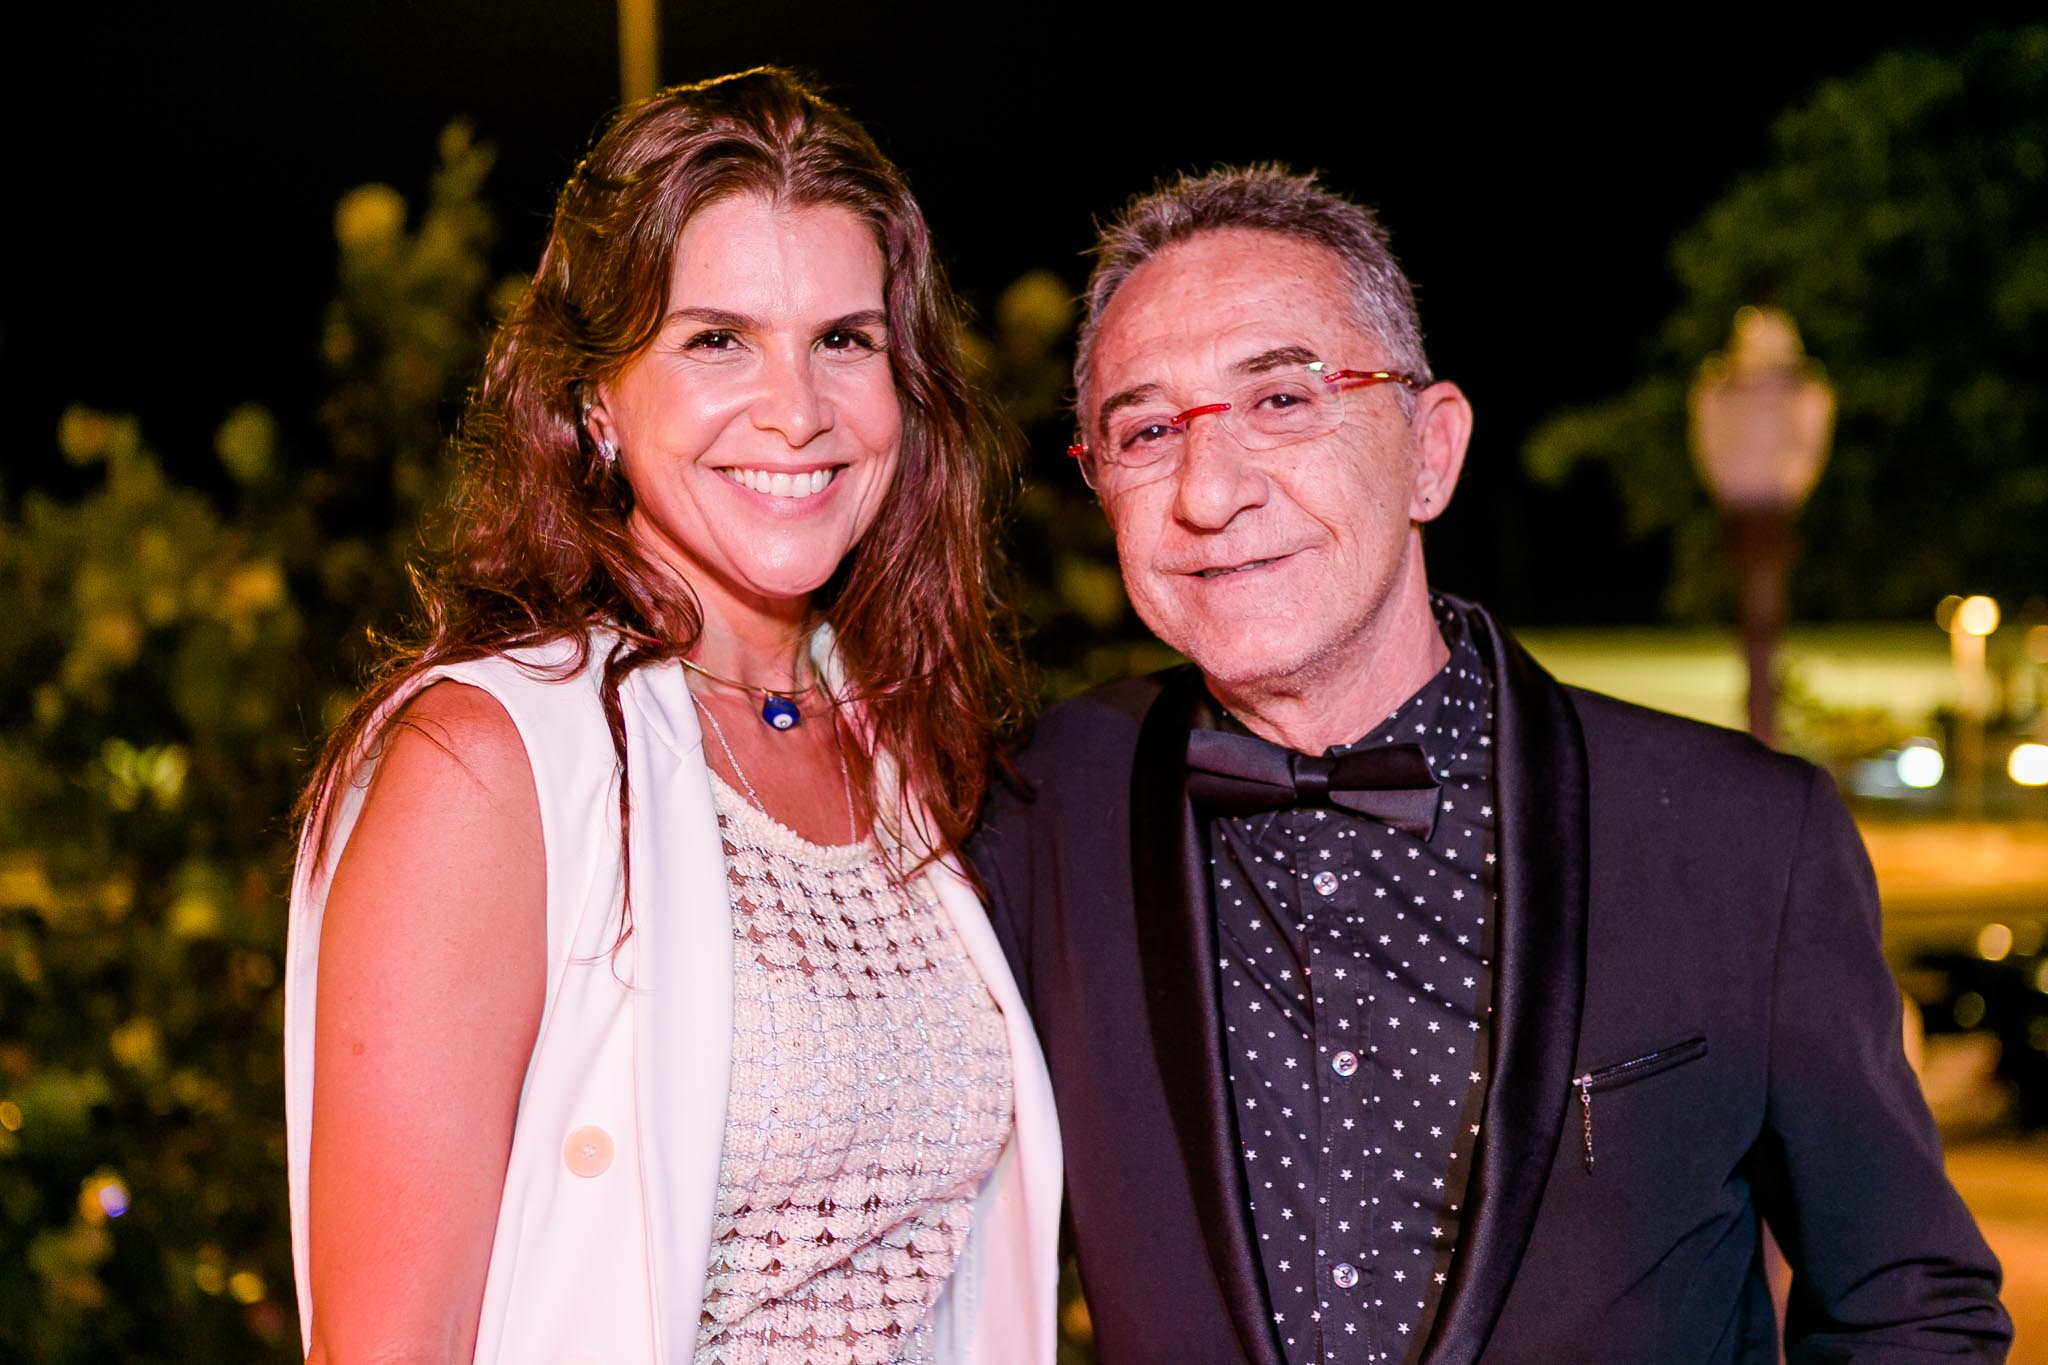 Ana Paula Padua e Cesar Hasky